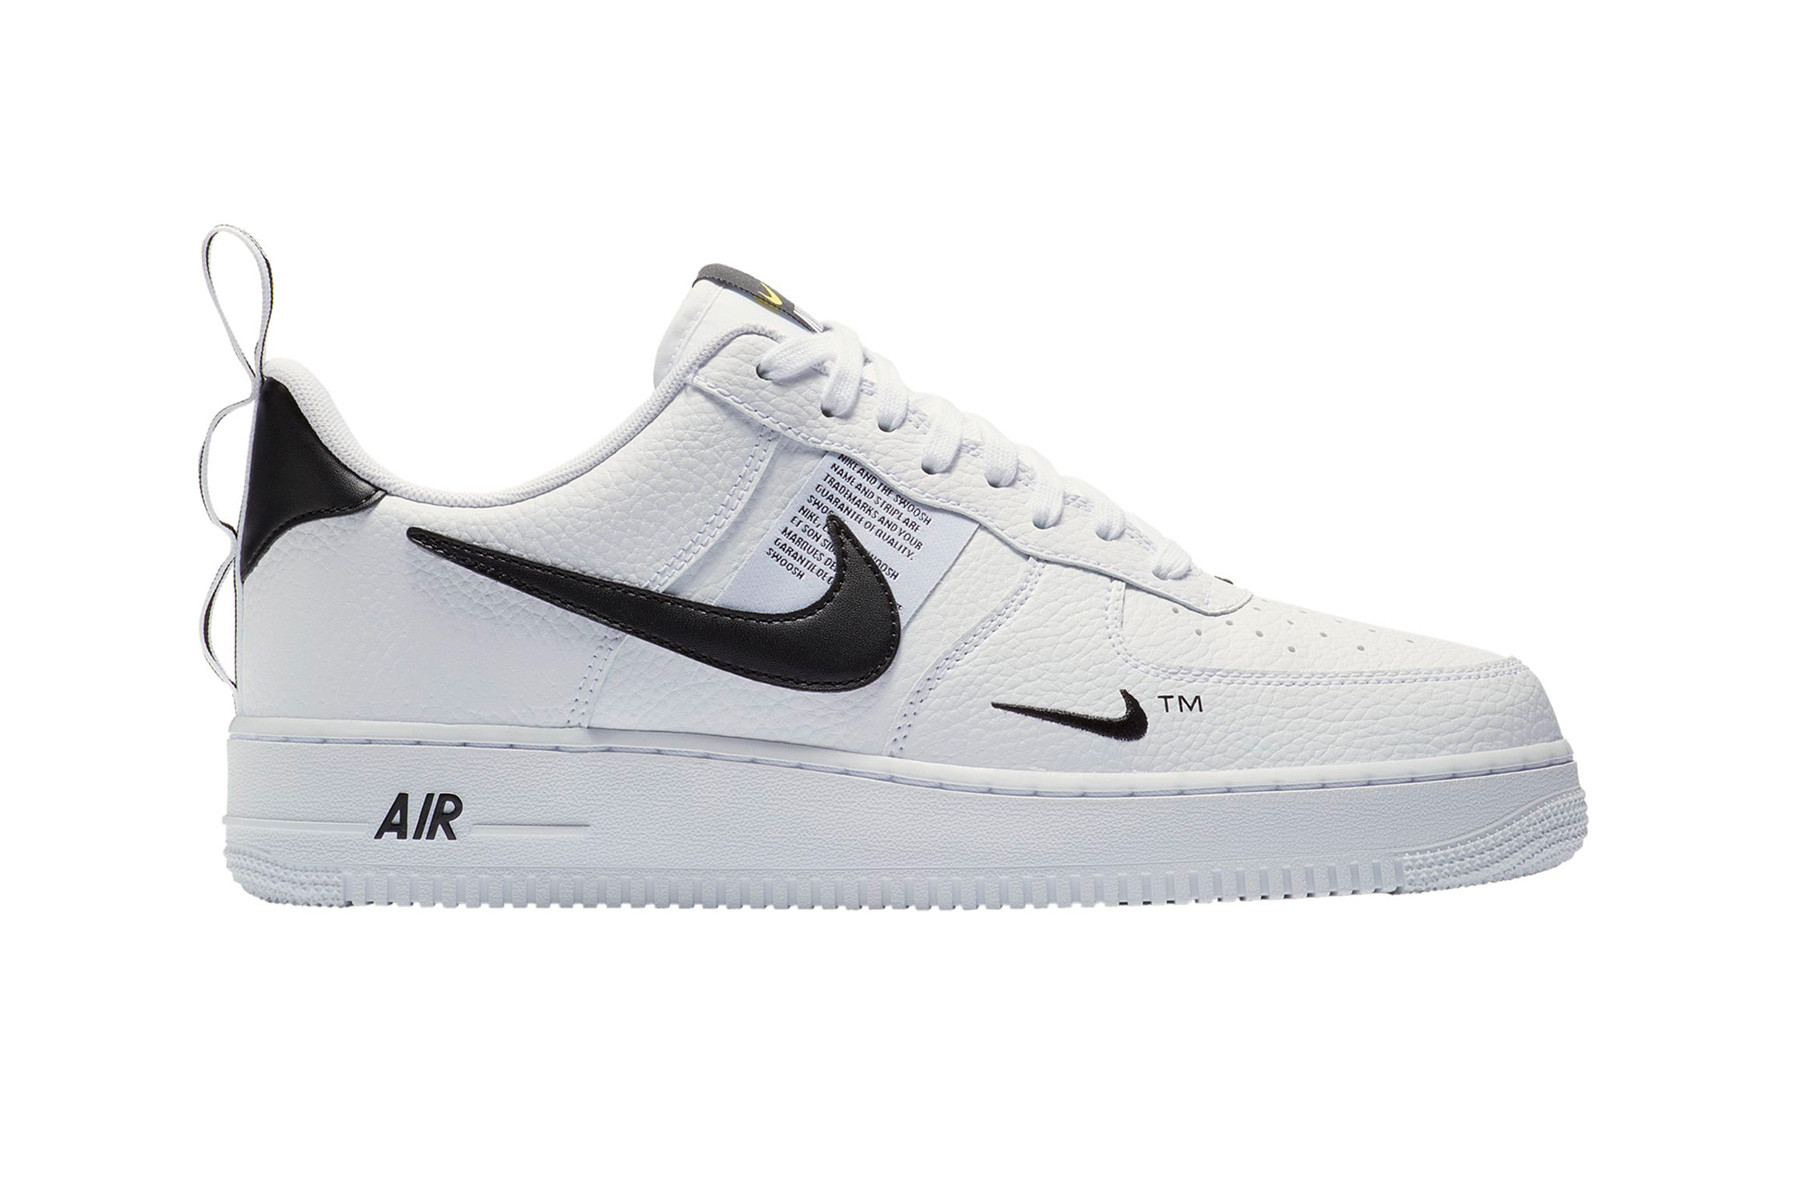 64ca2acf728d5a Air Force One White Nike Air Force 1 High   SPORTCAMP